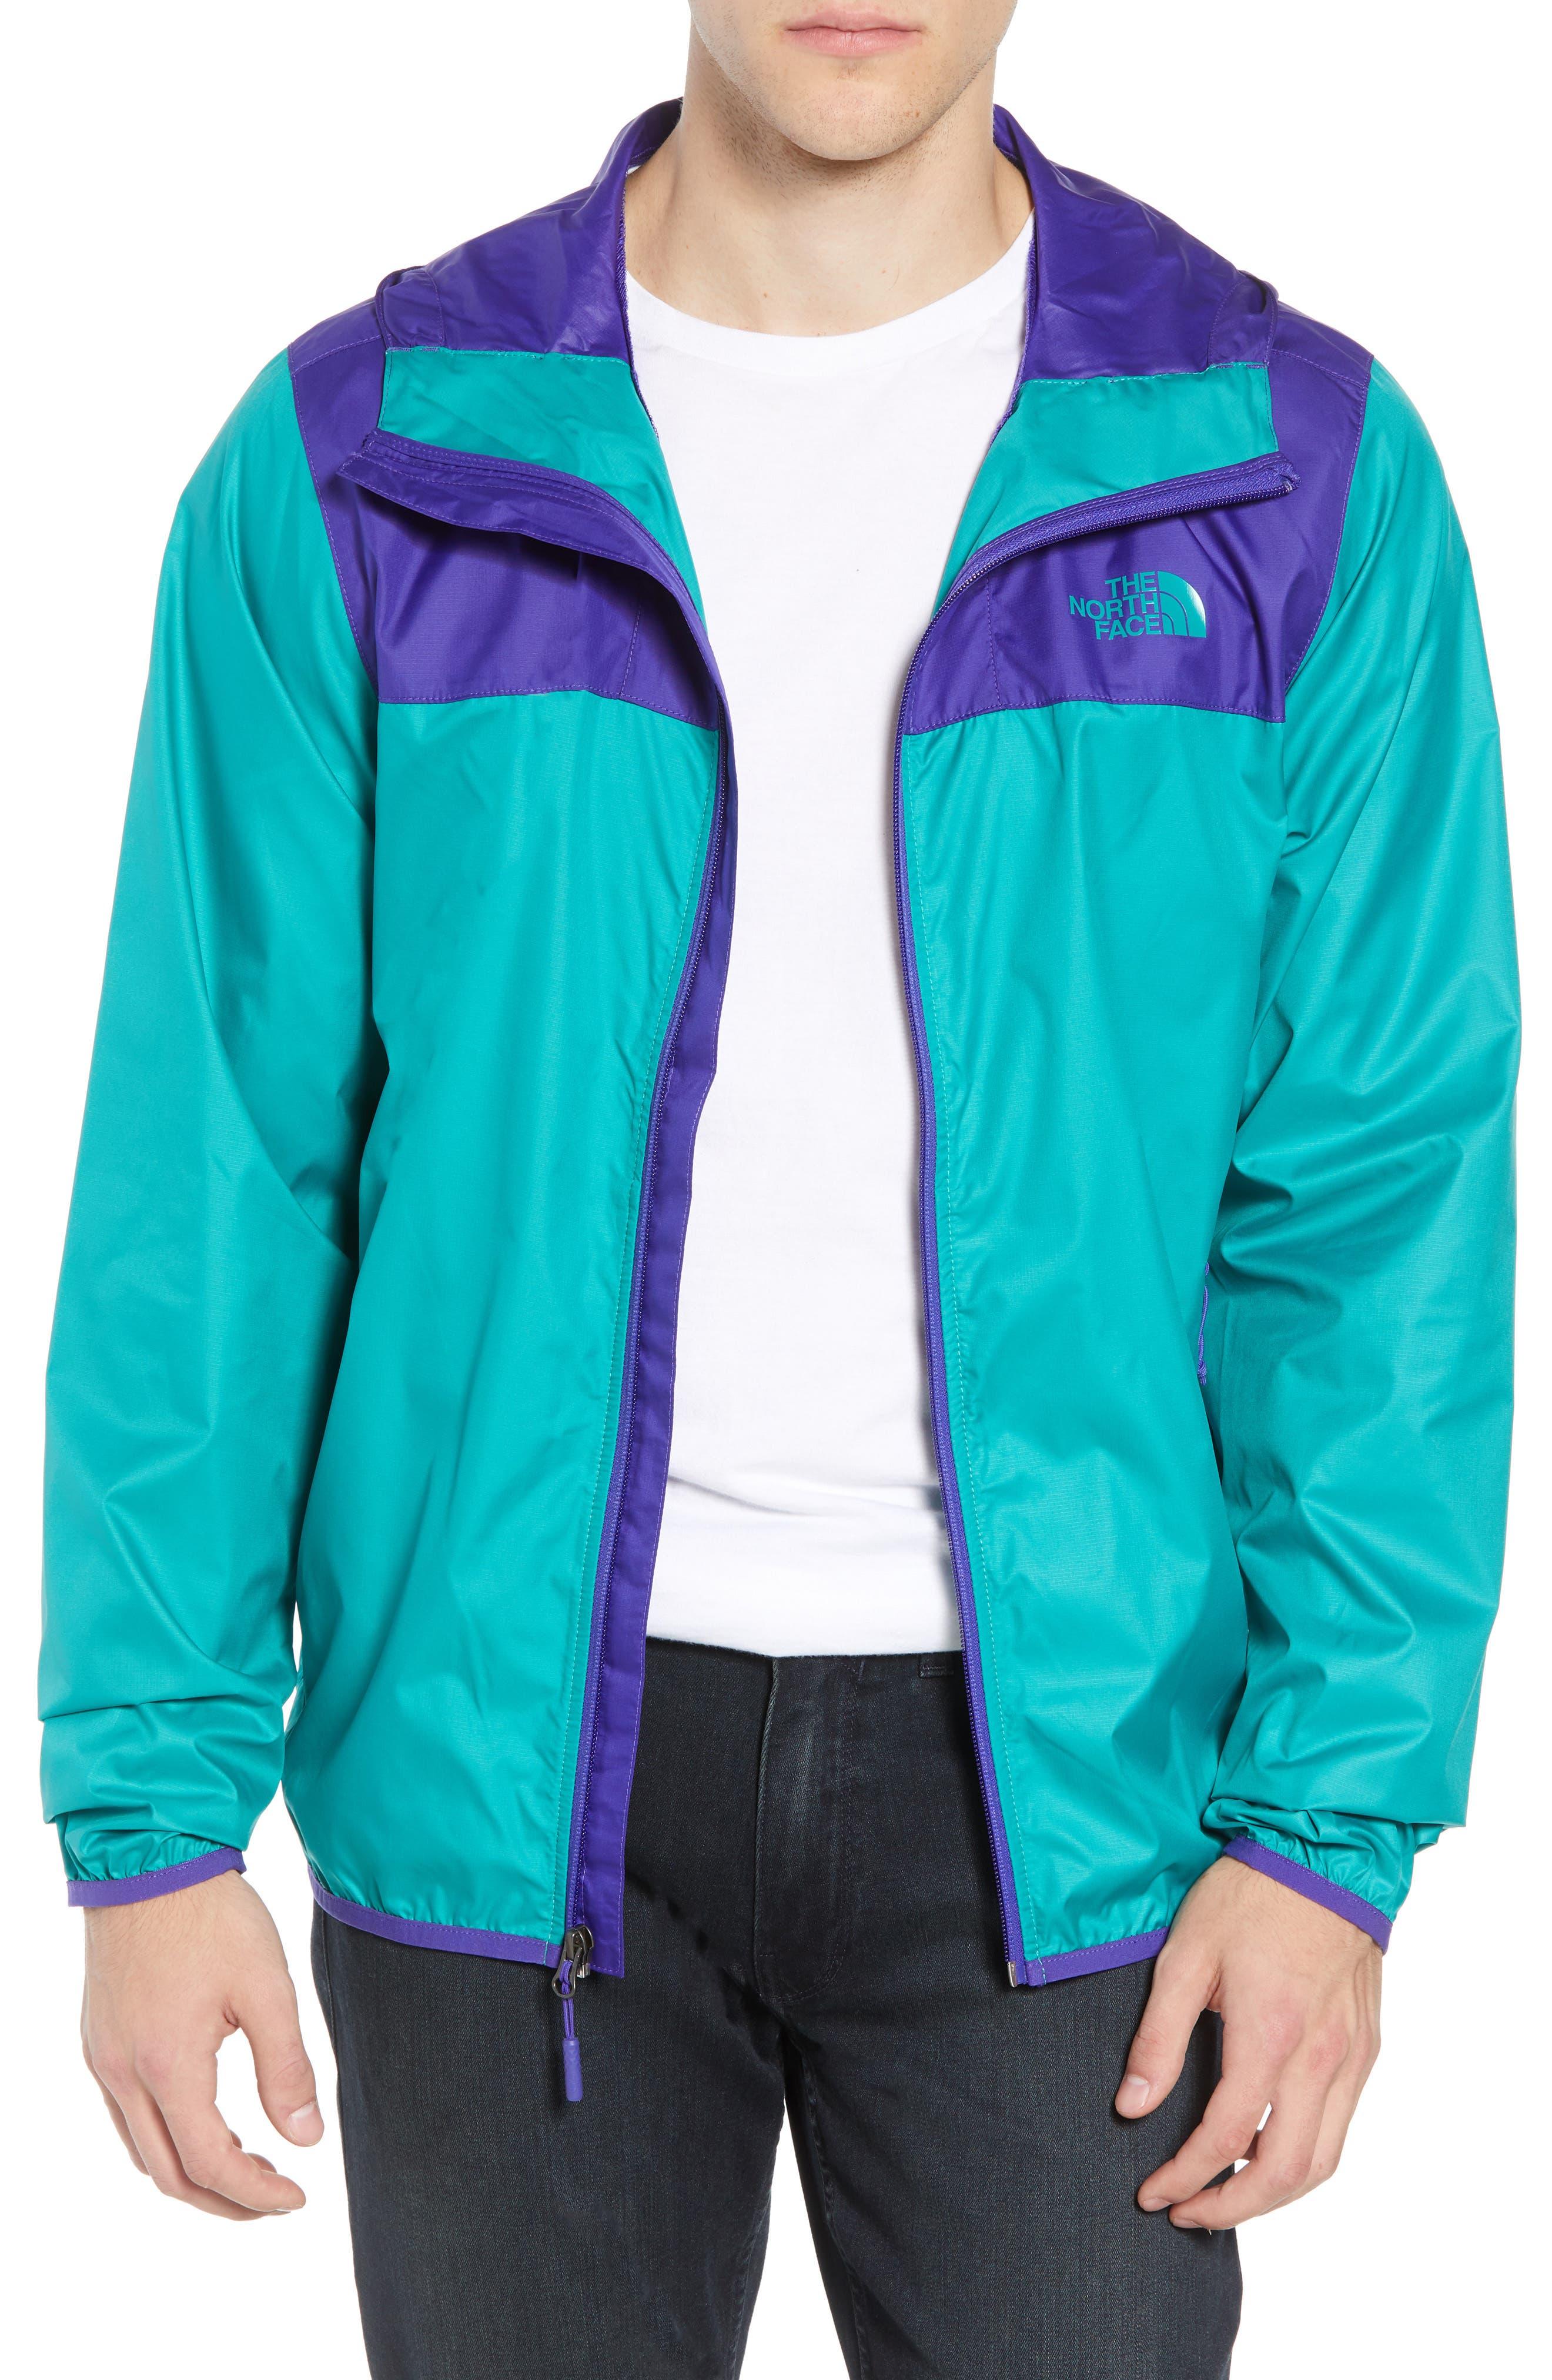 Cyclone 2 WindWall<sup>®</sup> Raincoat,                         Main,                         color, DEEP BLUE/ PORCELAIN GREEN